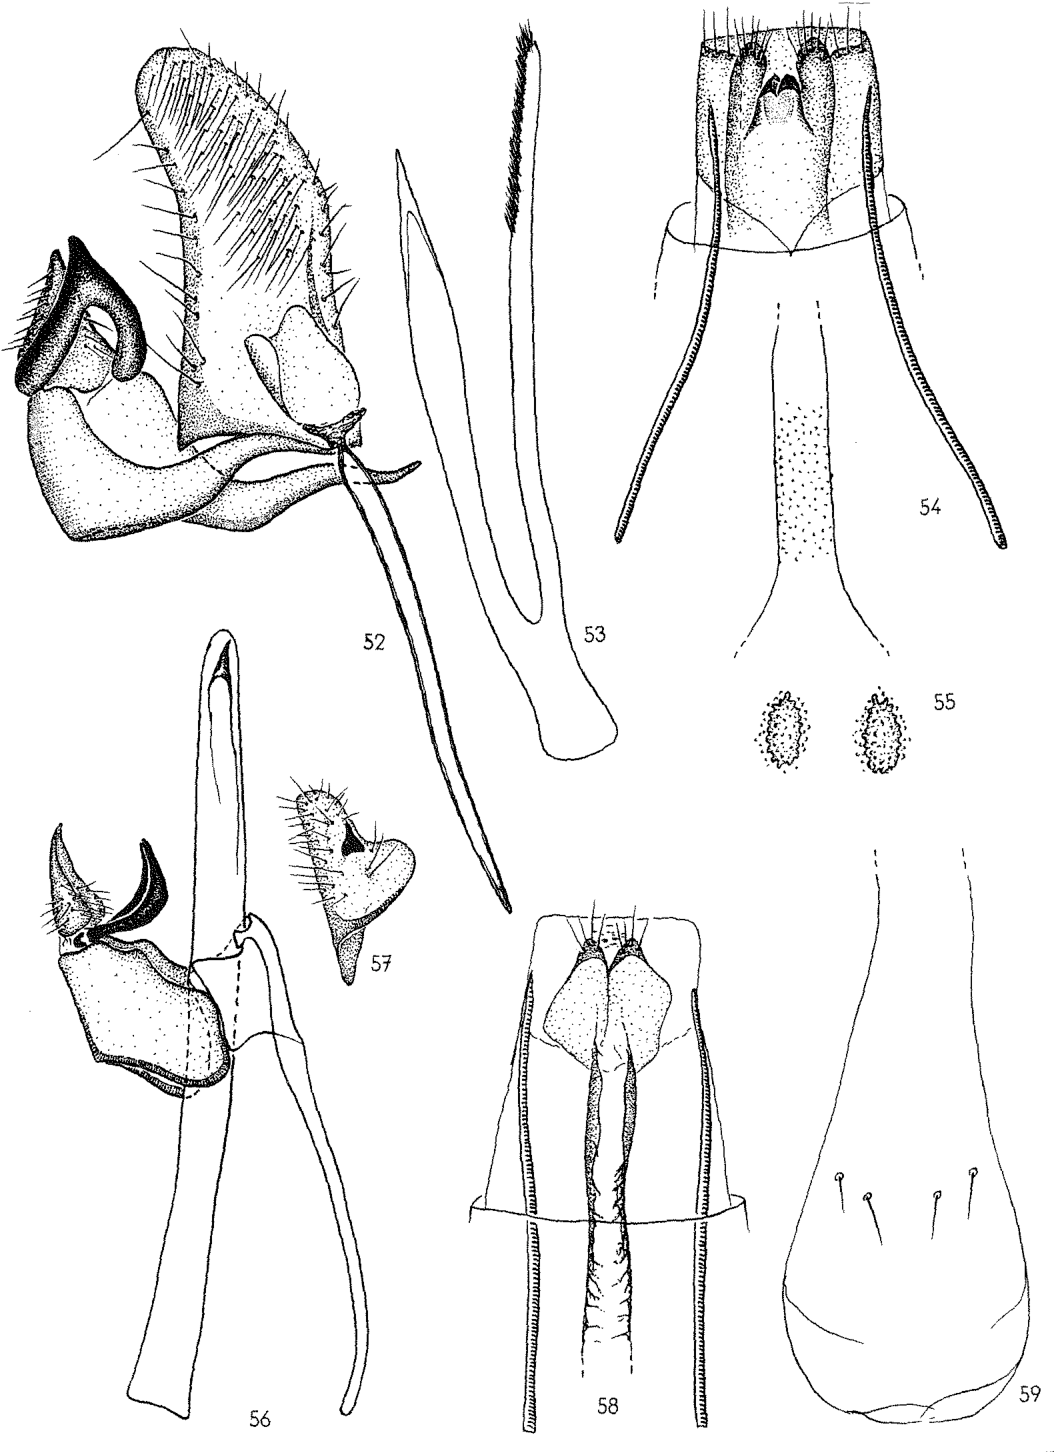 figure 52-55